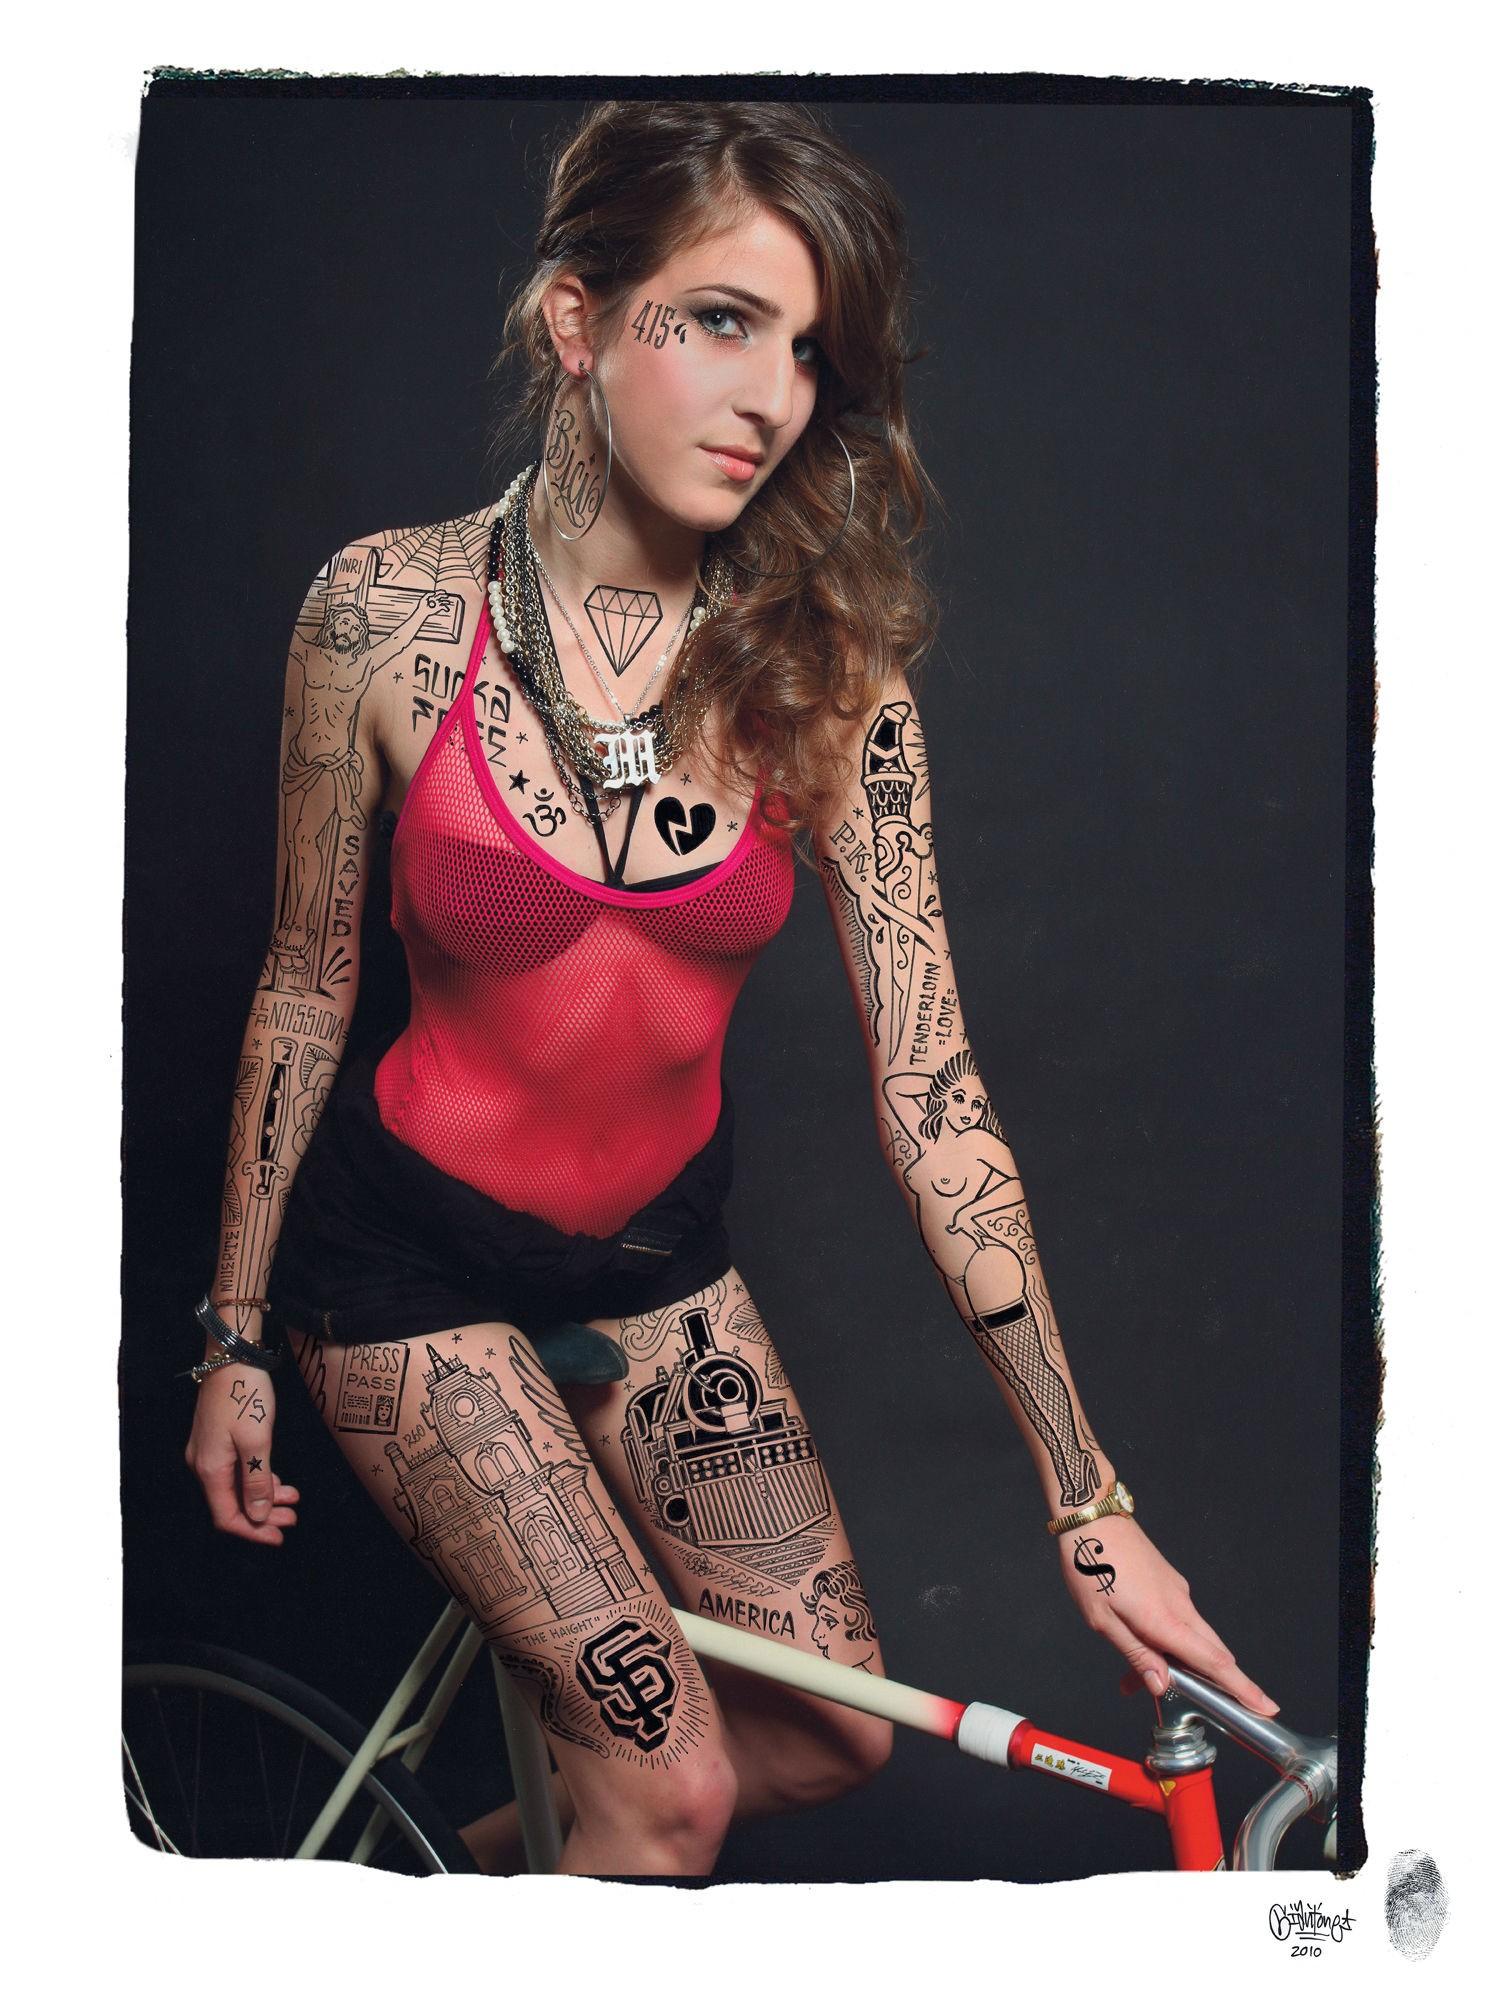 Майк Гигант, Mike Giant, Rebel8, Vans, Dickies, татуировщик, культура чоло, дальтоник